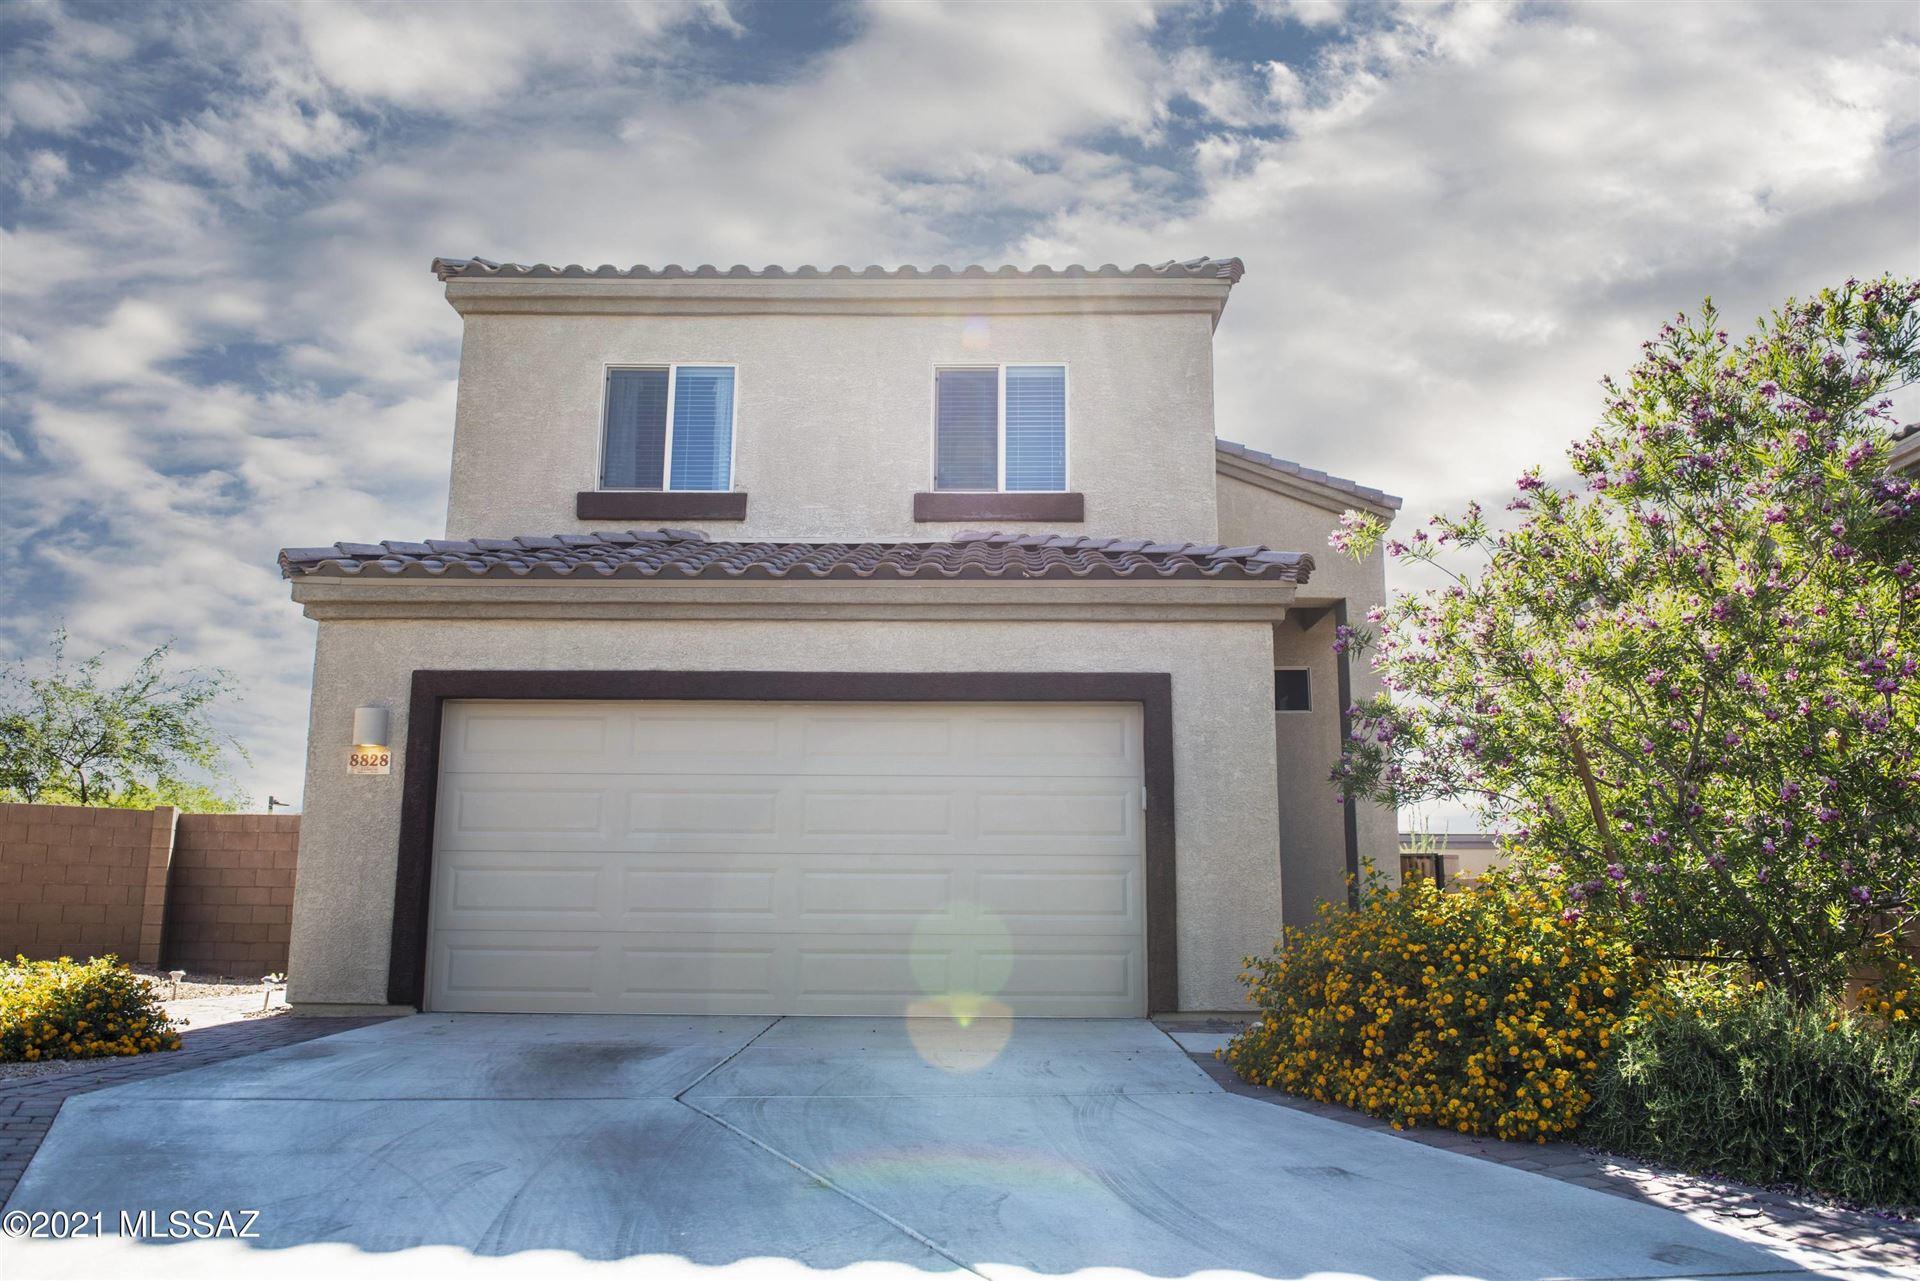 8828 E Abrams Loop, Tucson, AZ 85710 - MLS#: 22112747